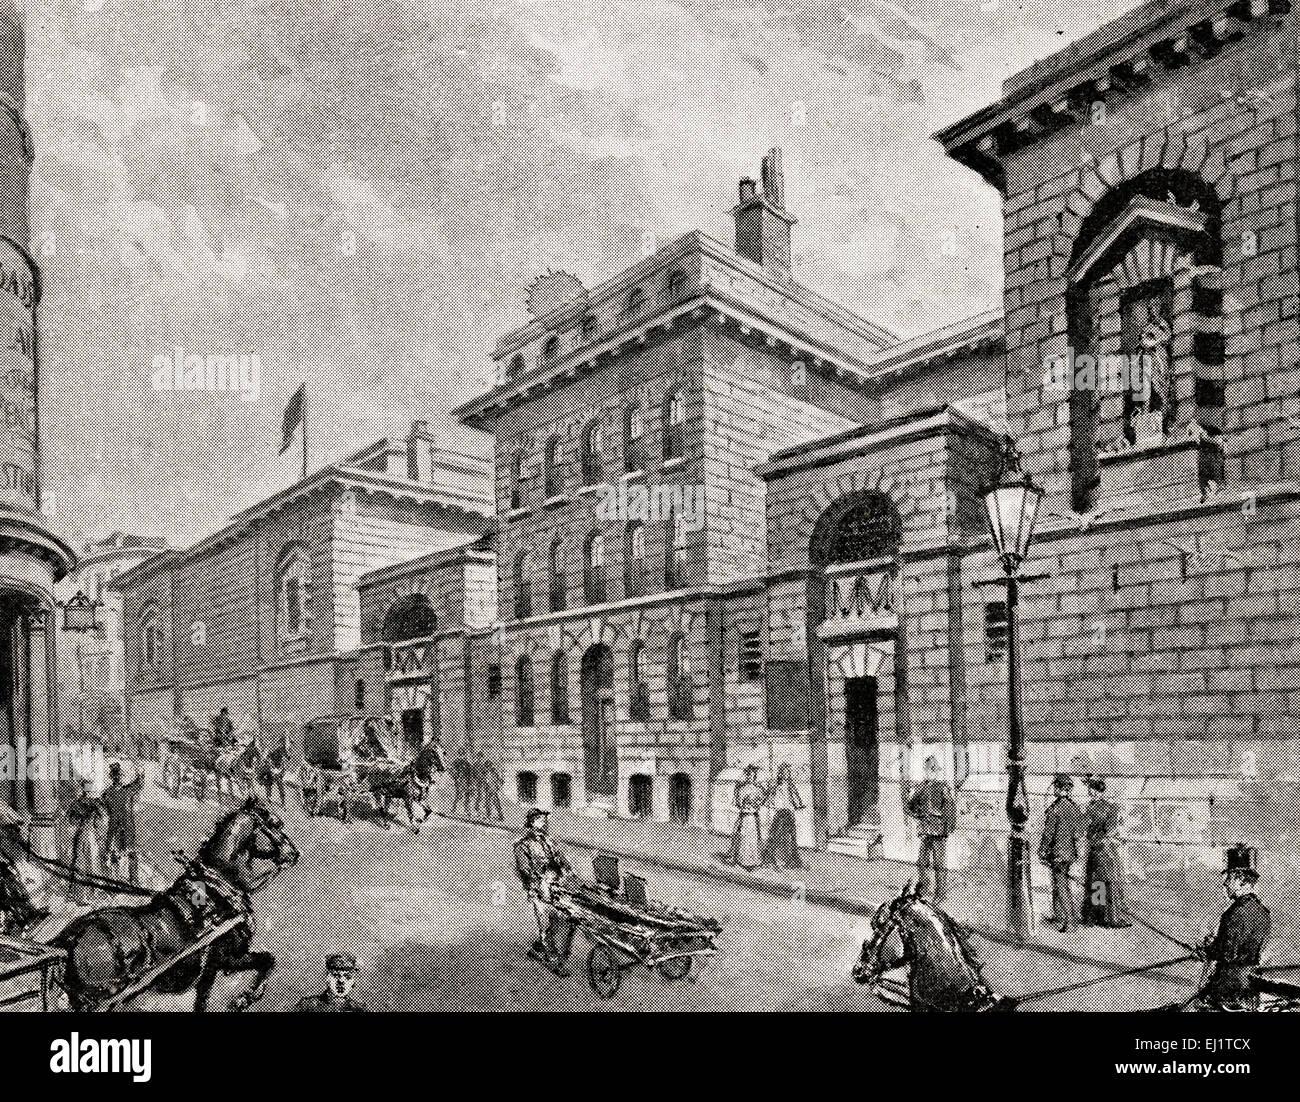 engraving of street scene outside newgate prison in victorian era